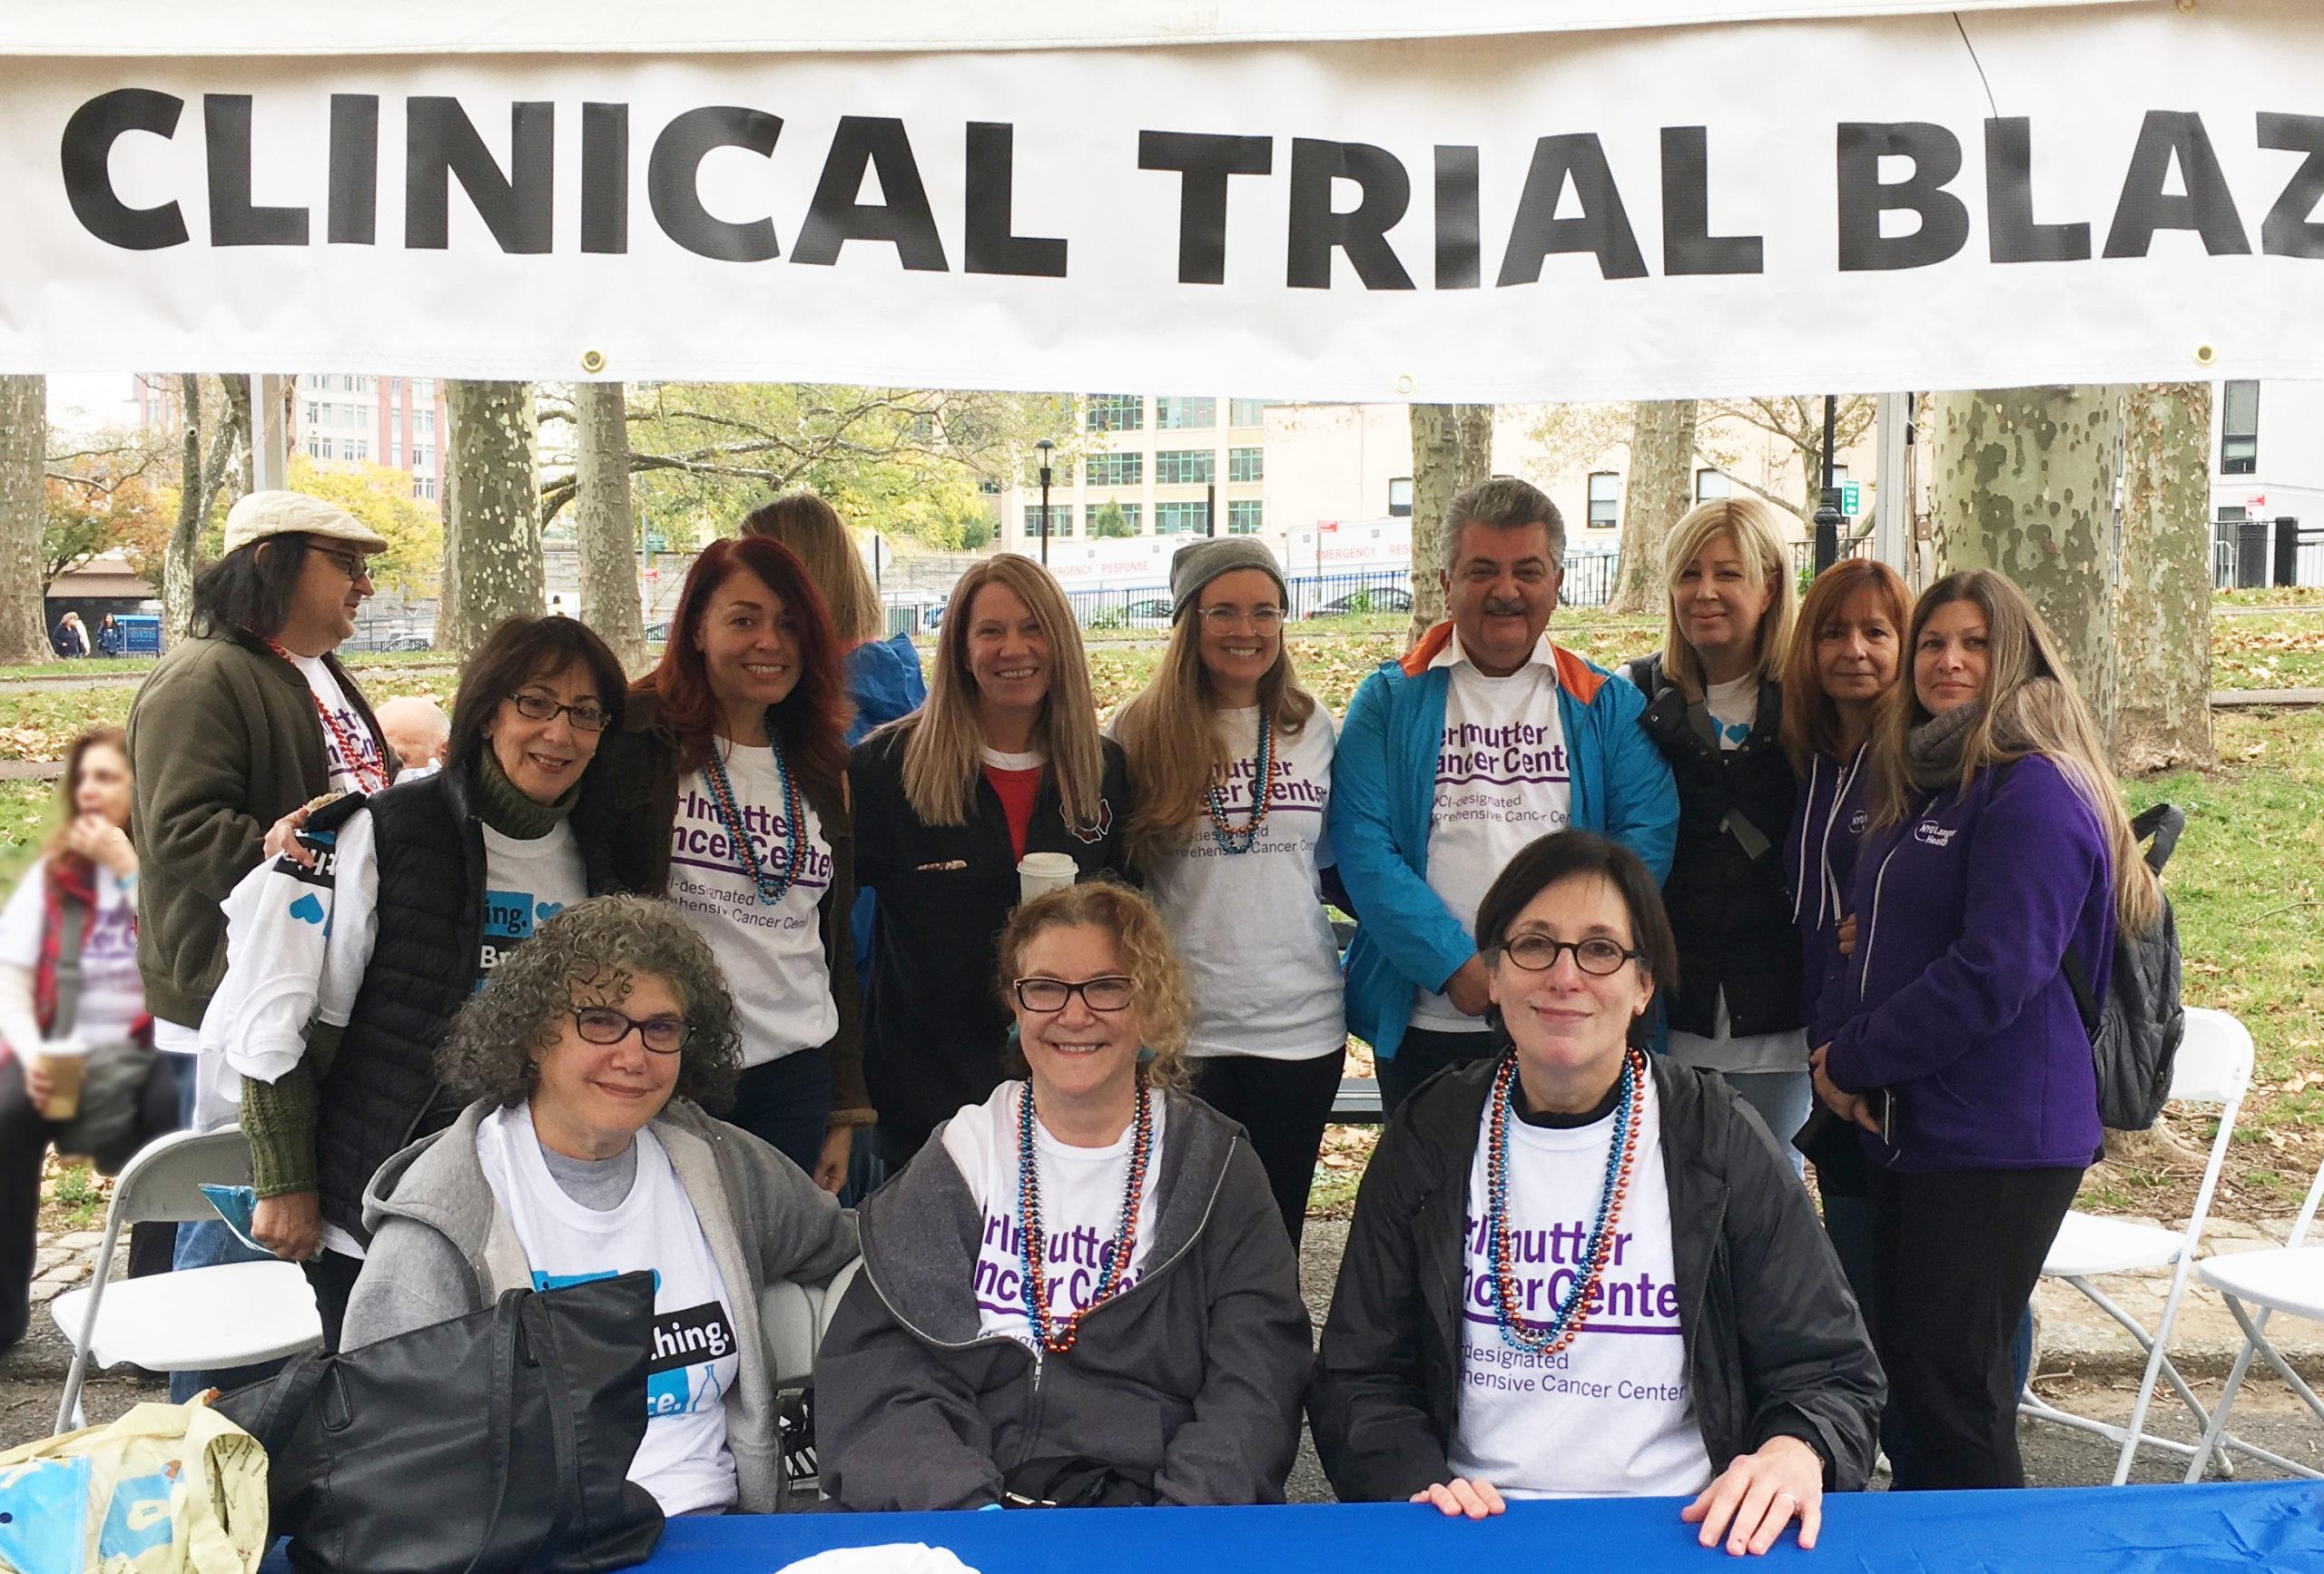 Clinical Trial Blazers